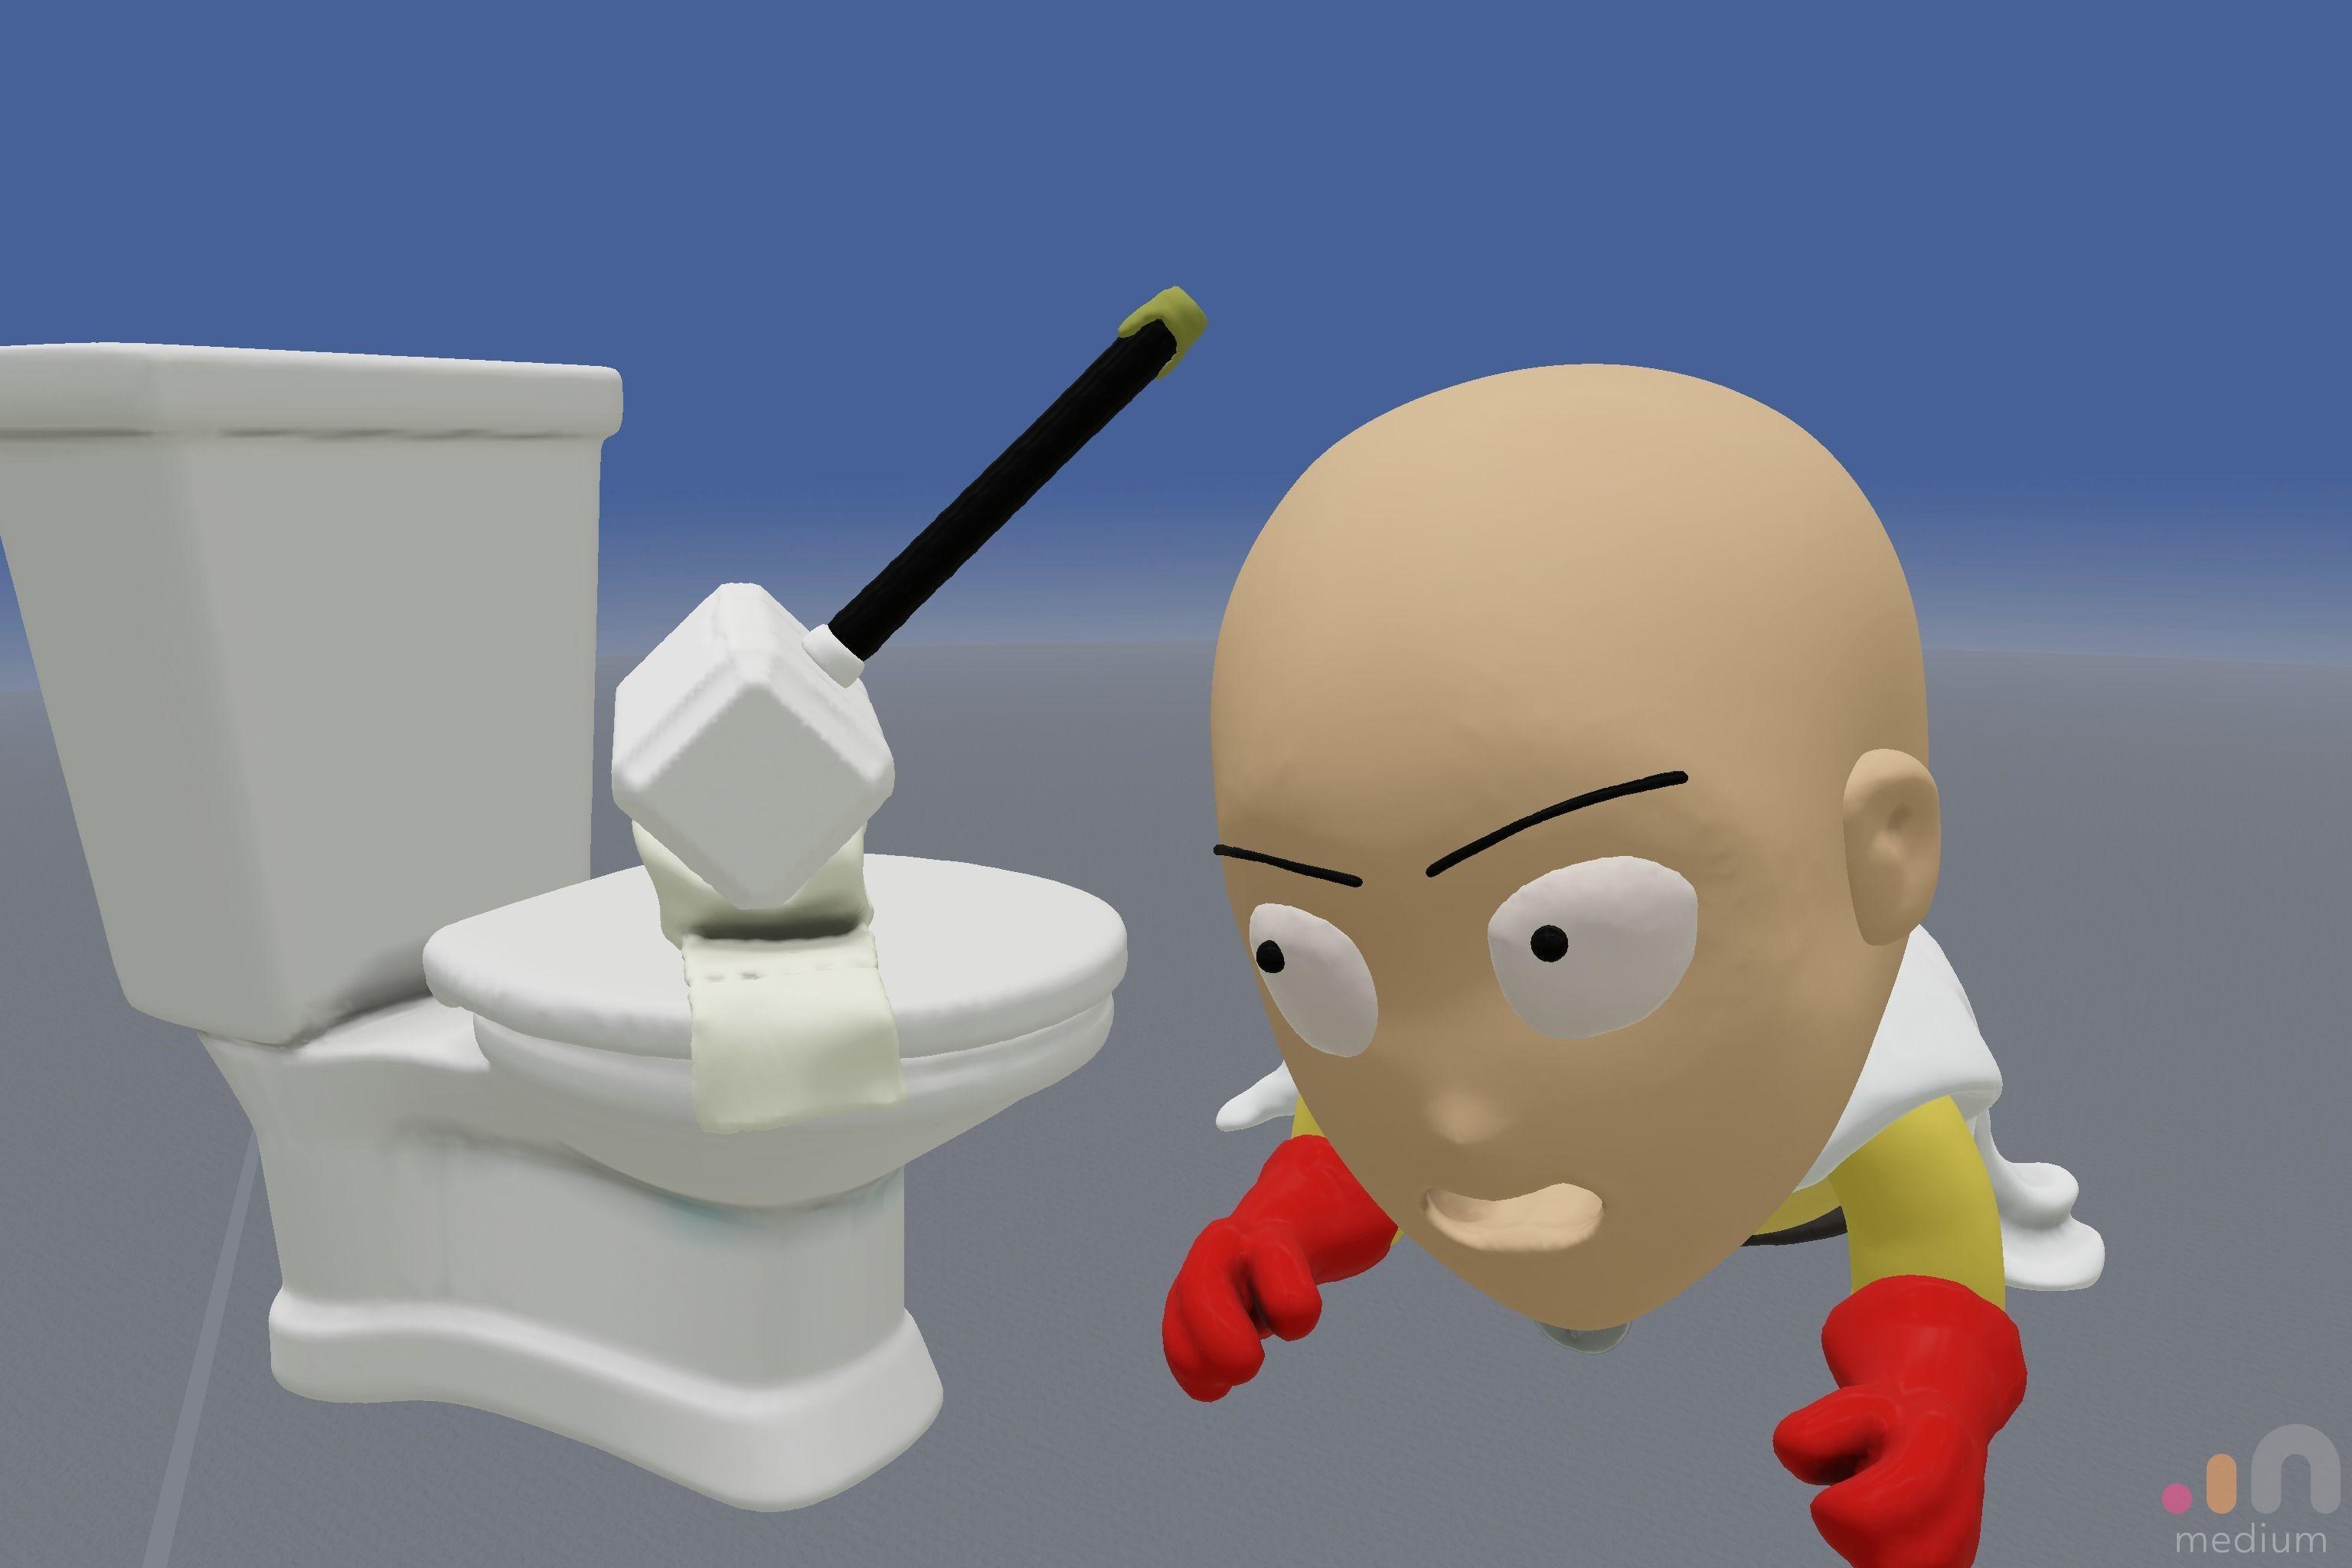 Meme One Punch Man meets Thors Hammer Toilet Prank | 3D model